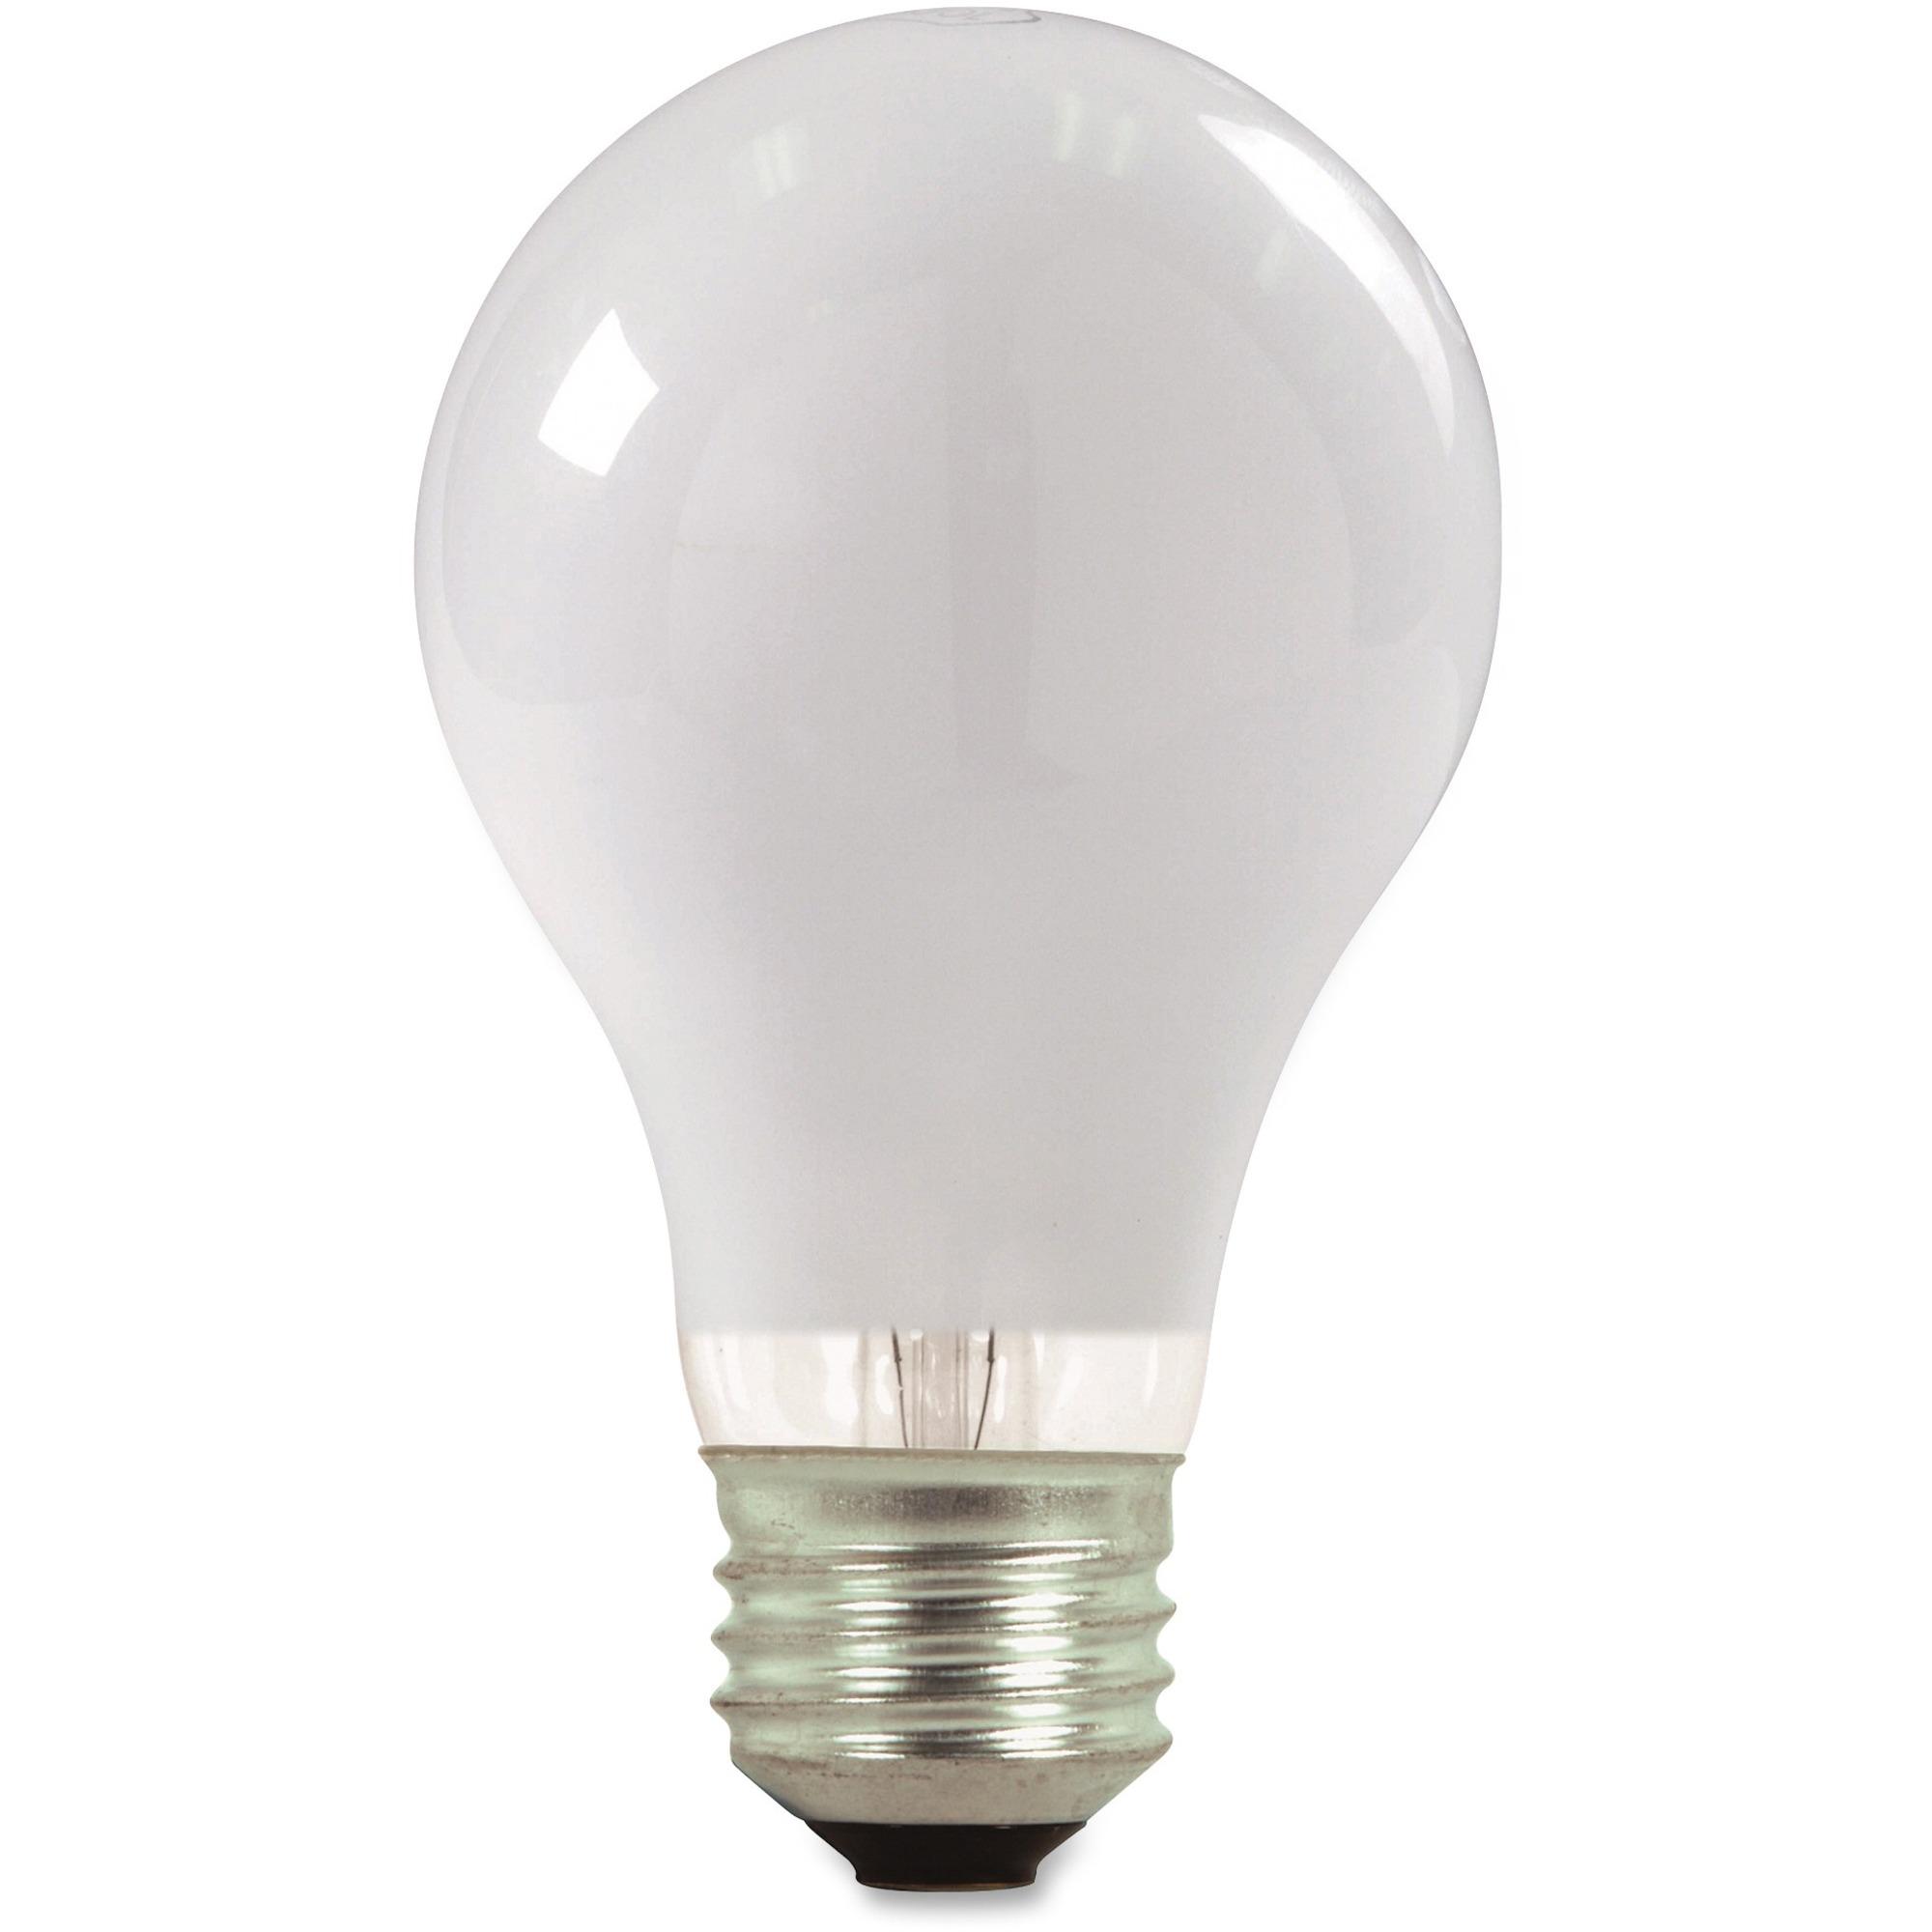 p xenon lighting com mini lamp prod toomanyamps bulb b src tokistar festoon